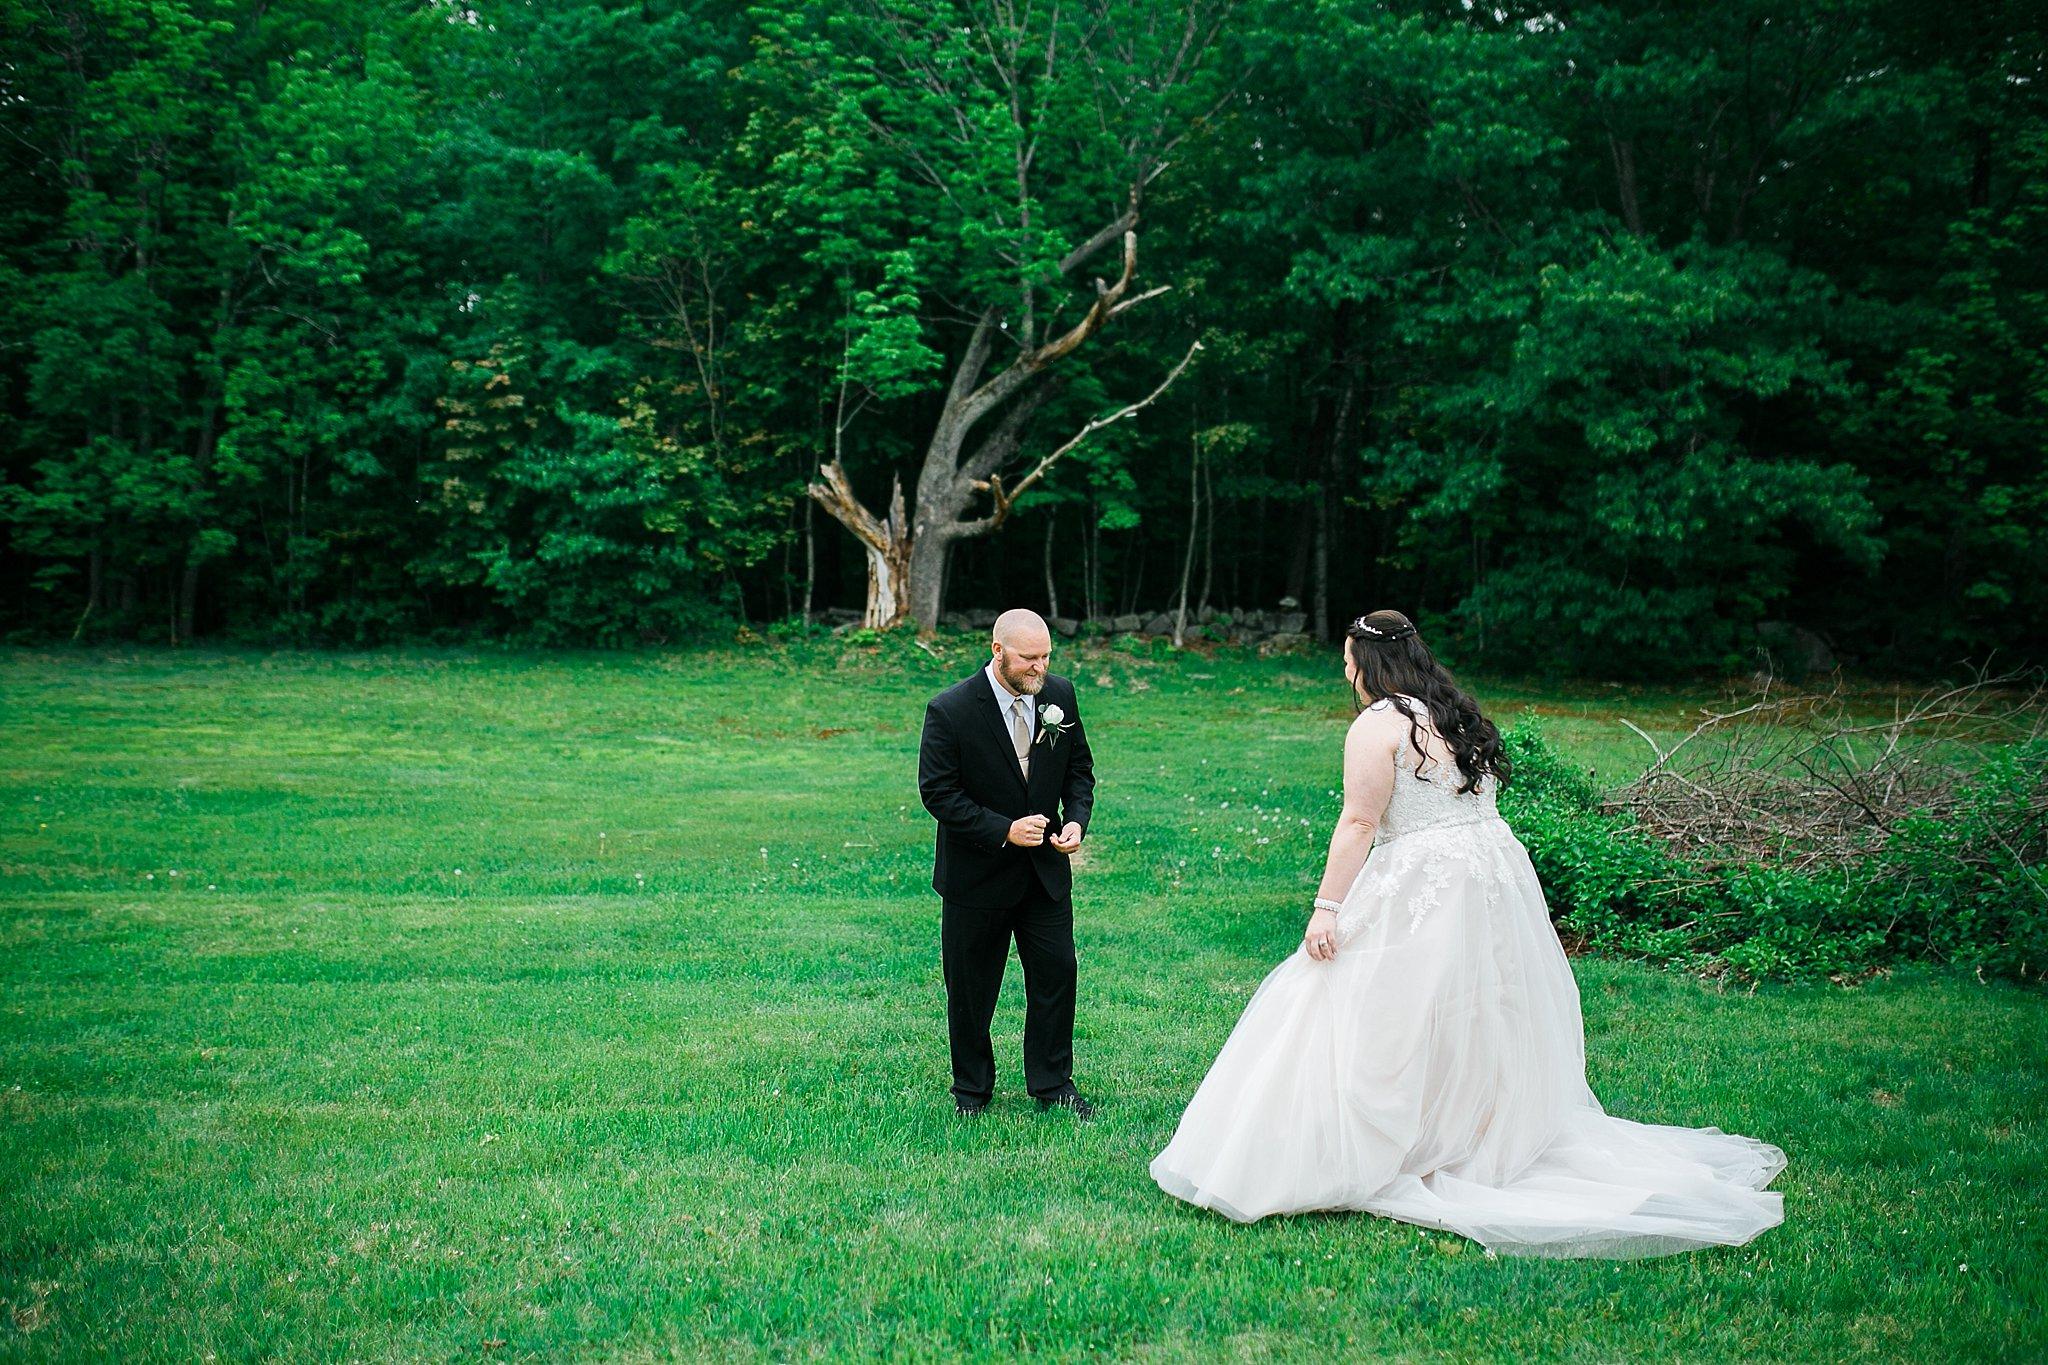 Preserve at Chocorua Tamworth NH Wedding May Wedding New Hampshire Wedding 25.jpg